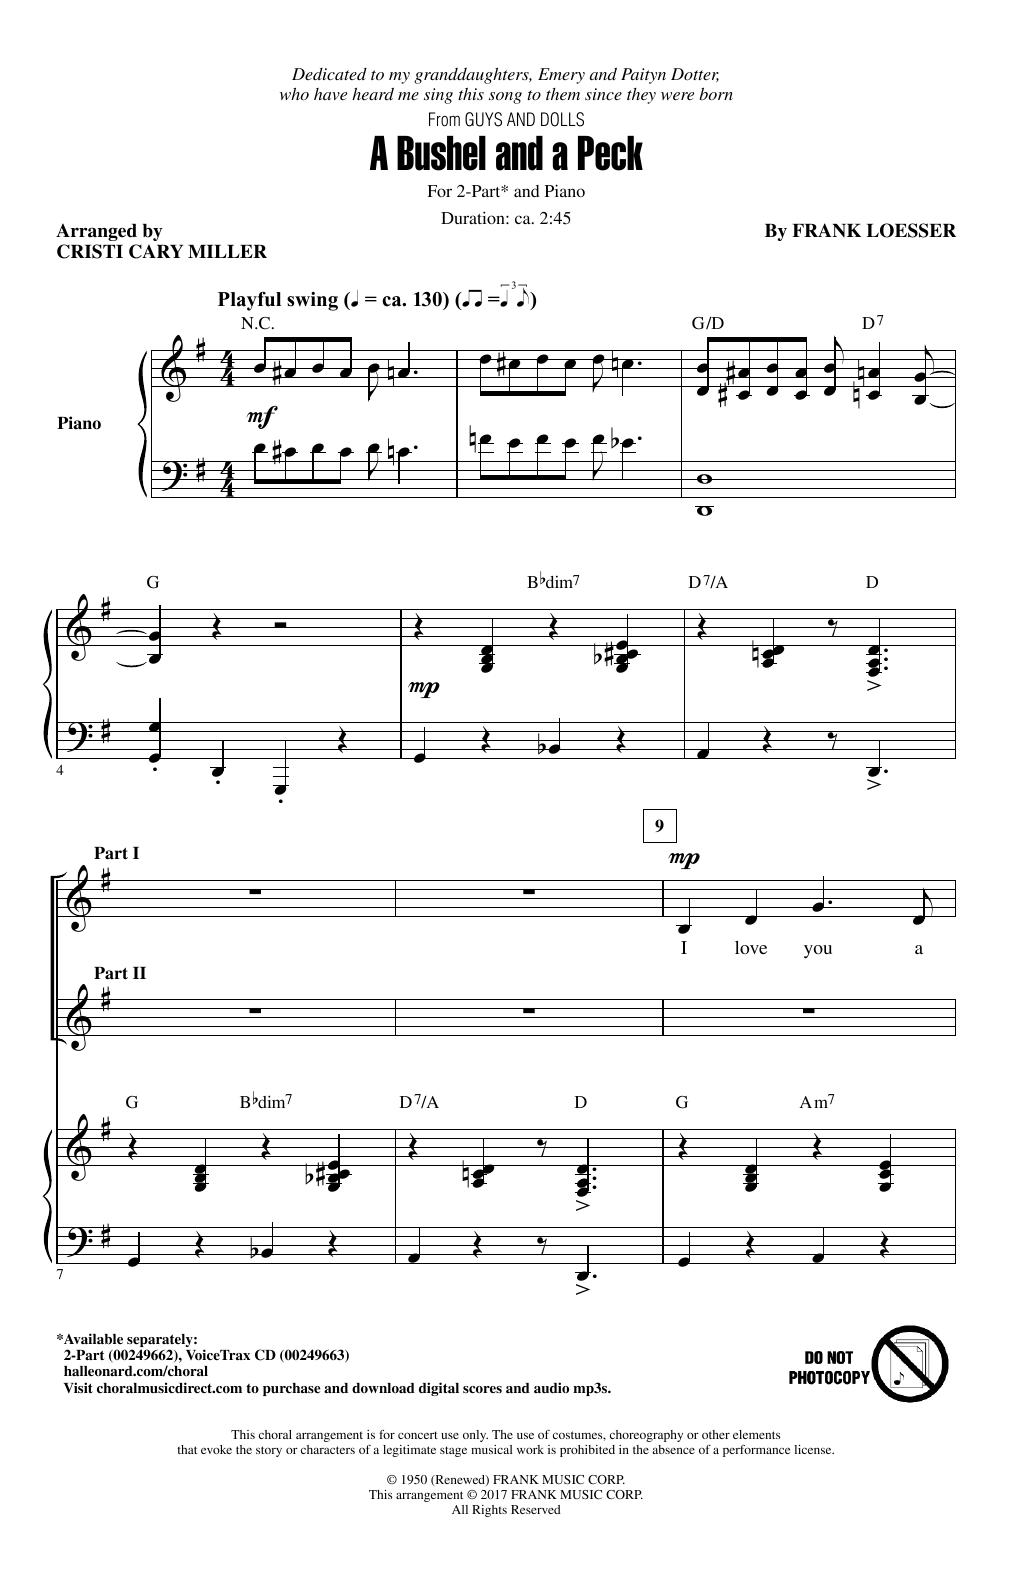 A Bushel And A Peck Sheet Music